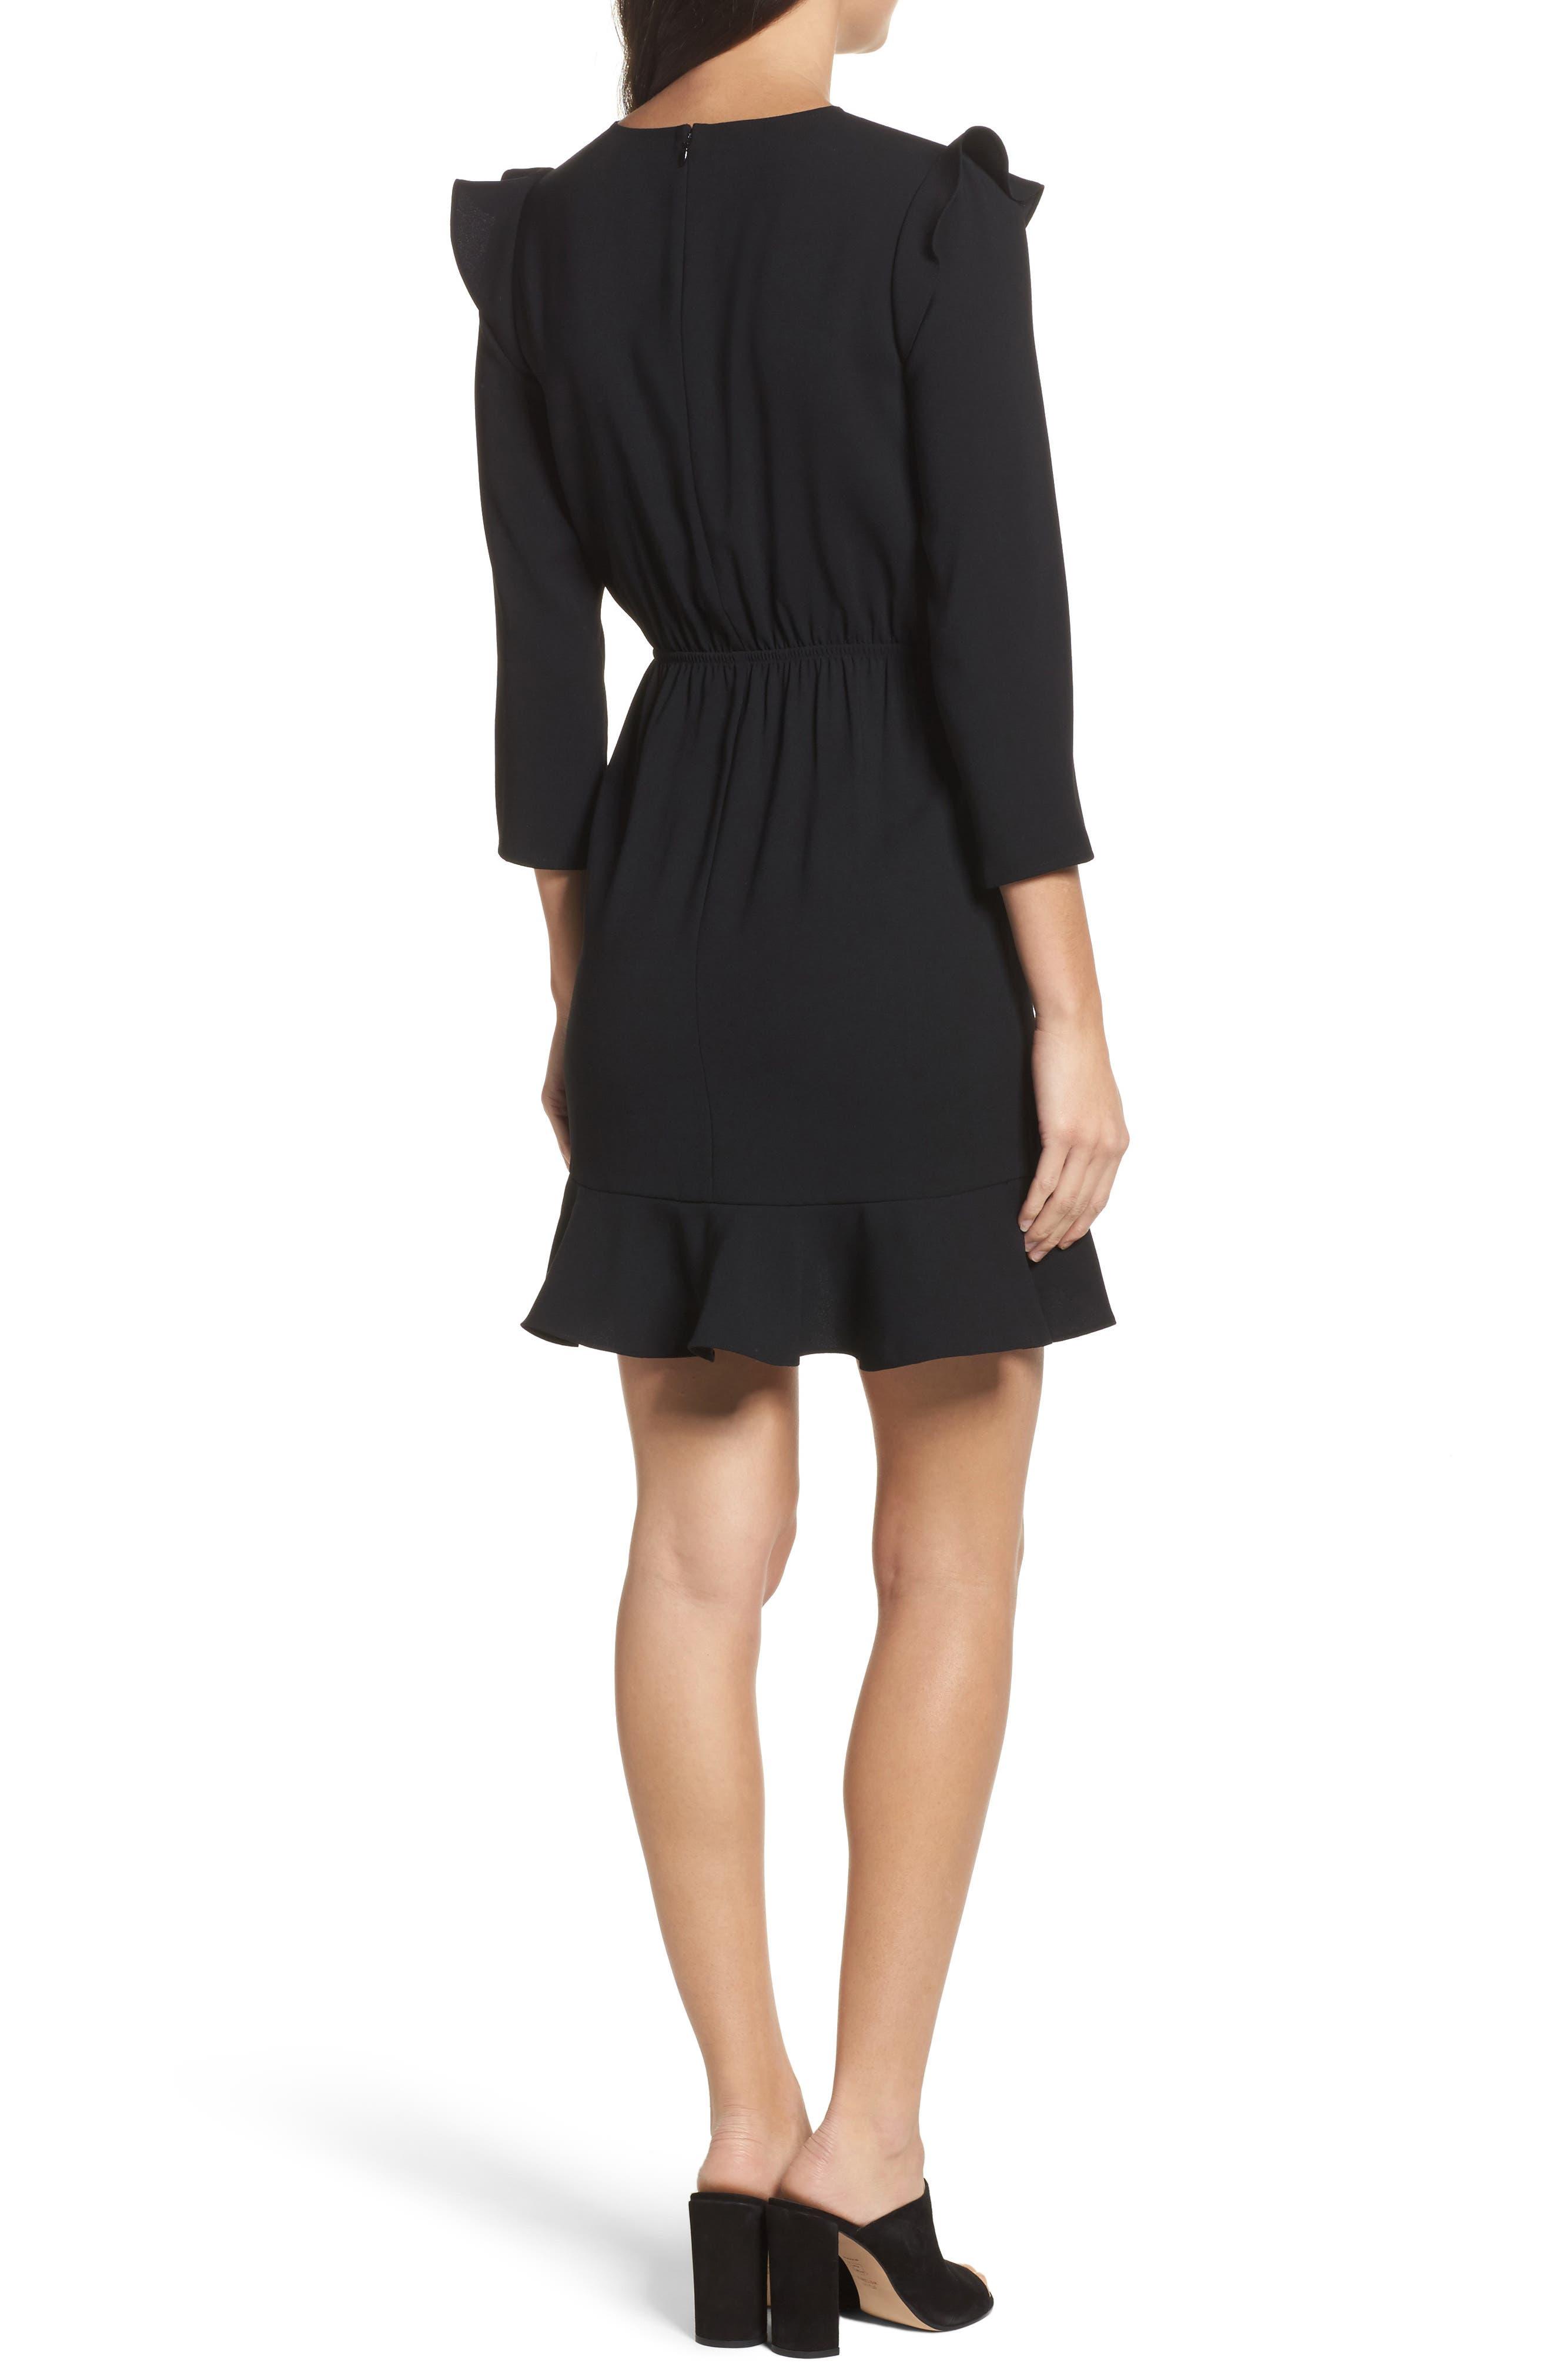 St Germain Ruffle Fit & Flare Dress,                             Alternate thumbnail 3, color,